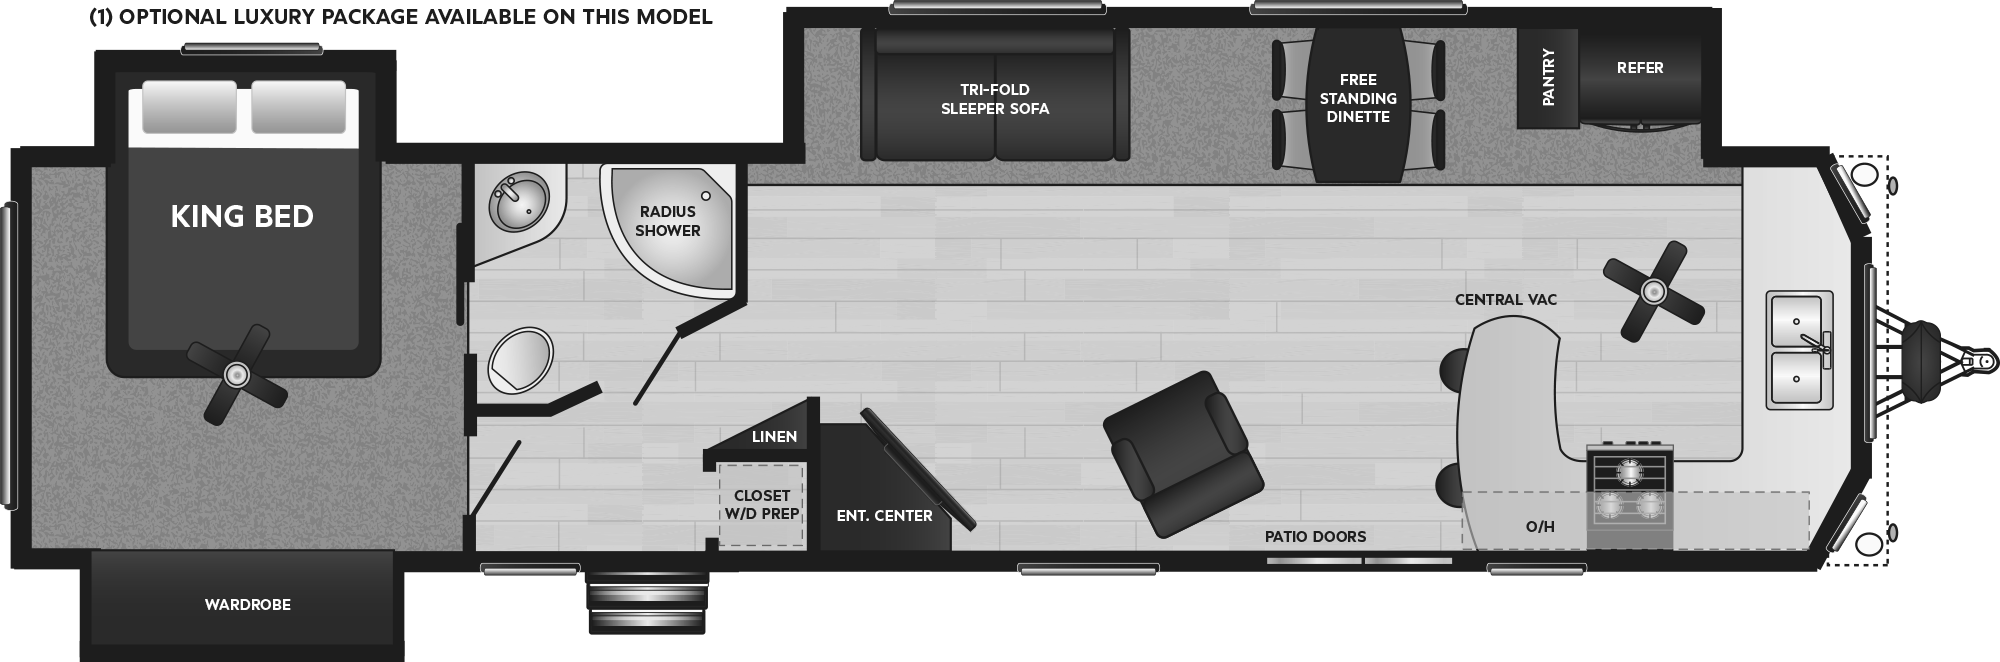 Retreat 39FKSS floorplan